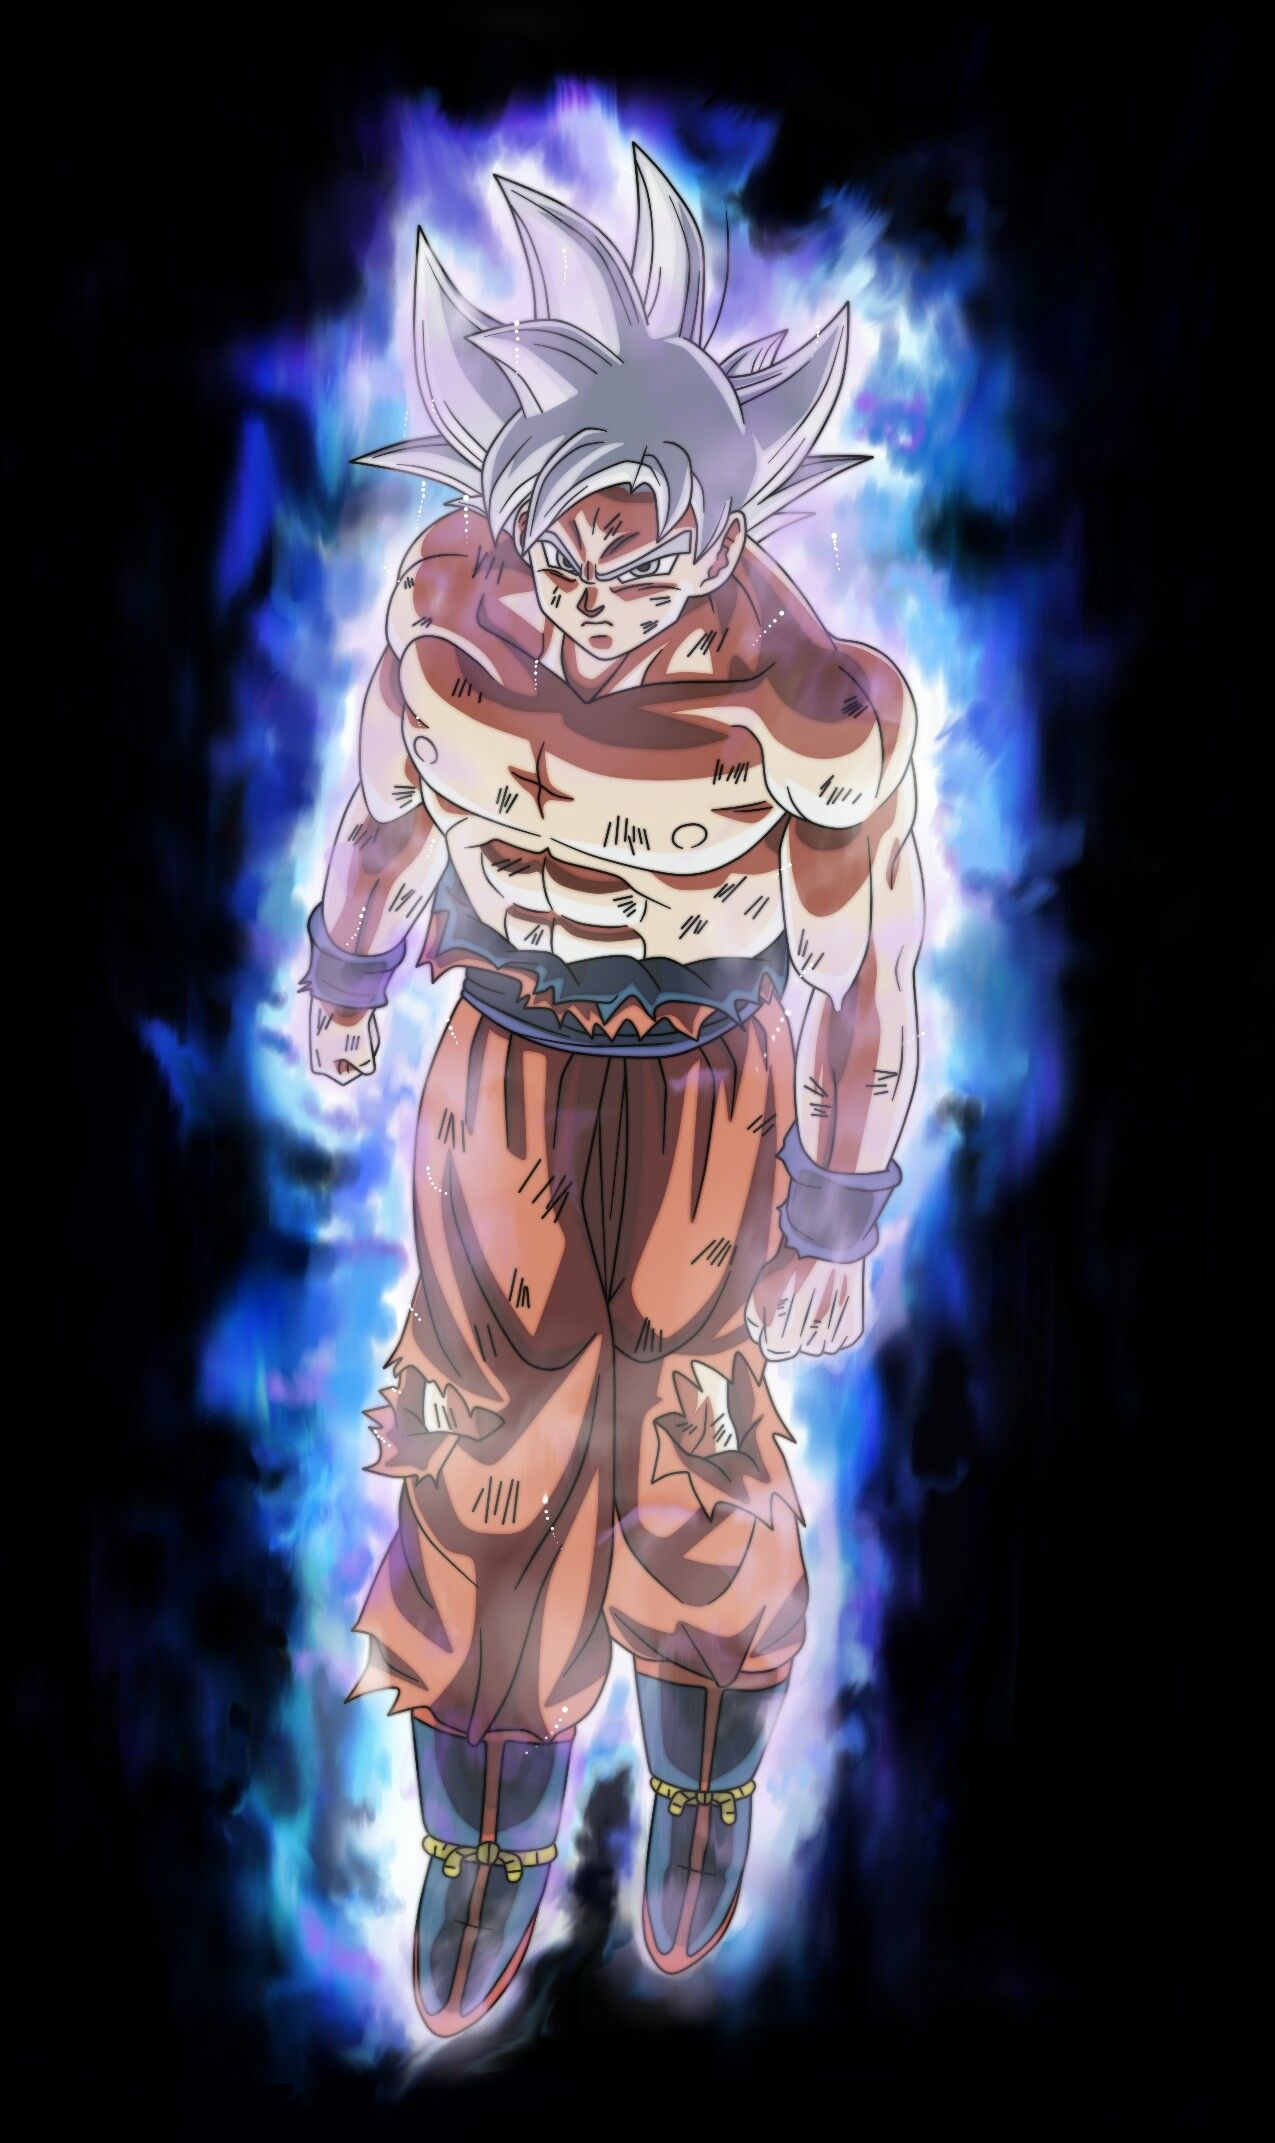 Goku ultra instinto dominado universo 7 drag n ball super goku dragon ball z y dragones - Imagenes de dragon ball super ultra instinto ...